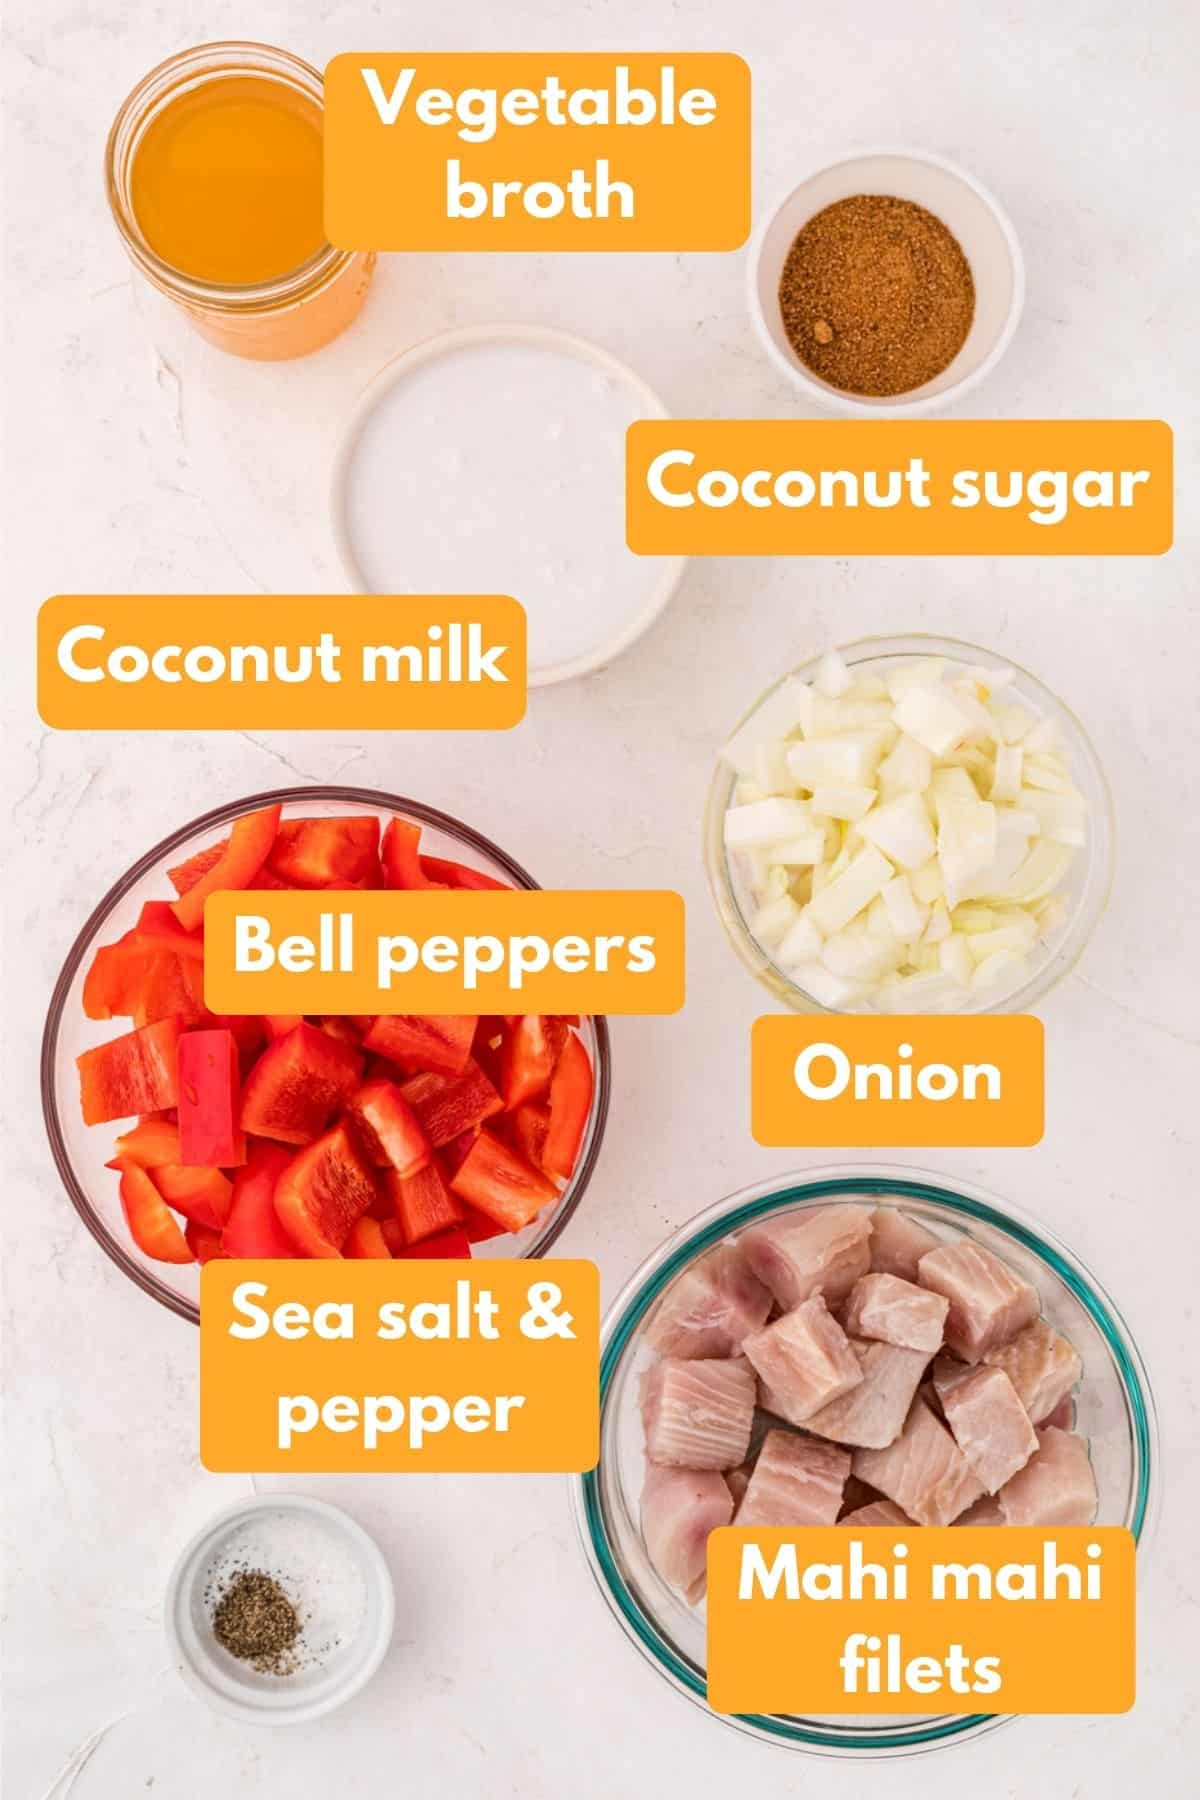 ingredients for coconut mahi mahi